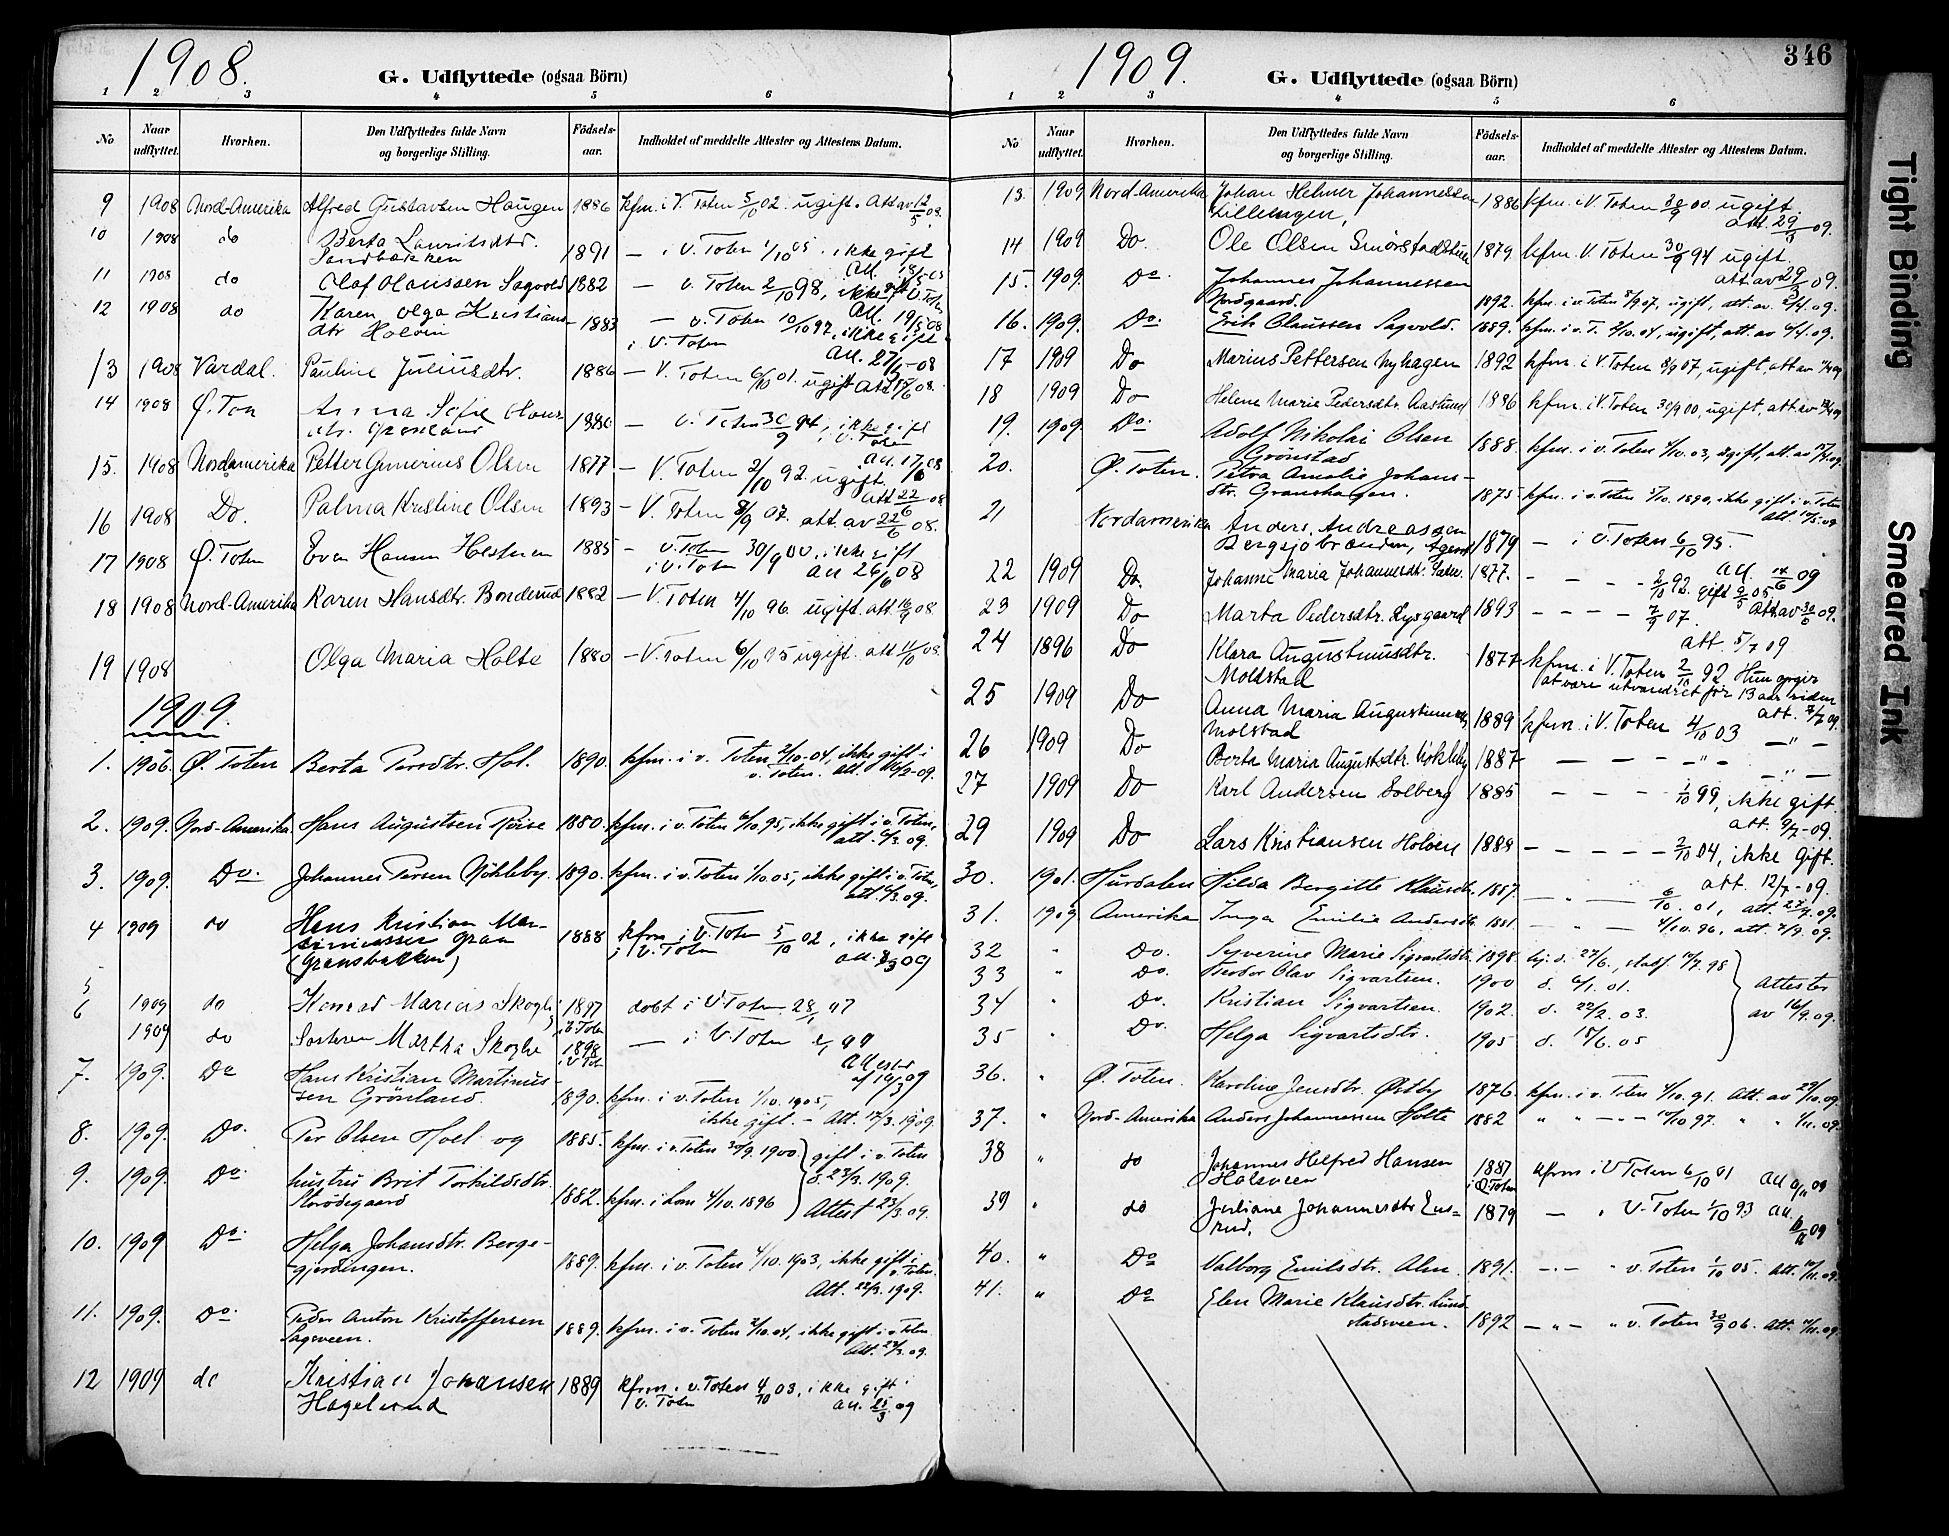 SAH, Vestre Toten prestekontor, H/Ha/Haa/L0013: Ministerialbok nr. 13, 1895-1911, s. 346